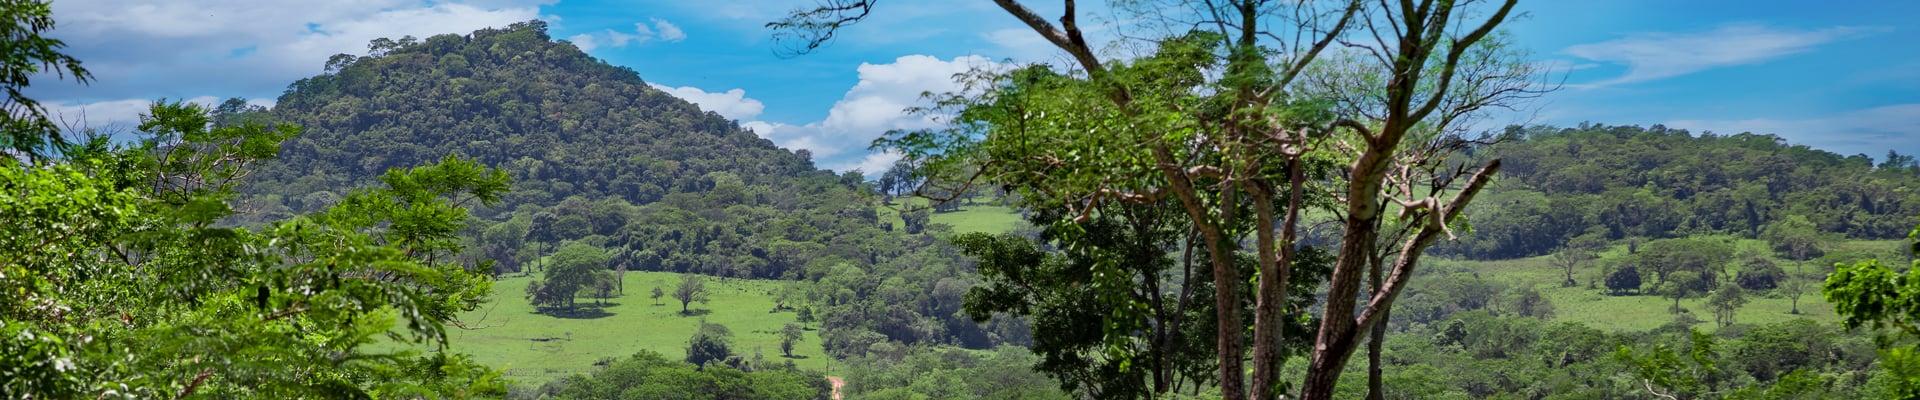 El Valle, Panama